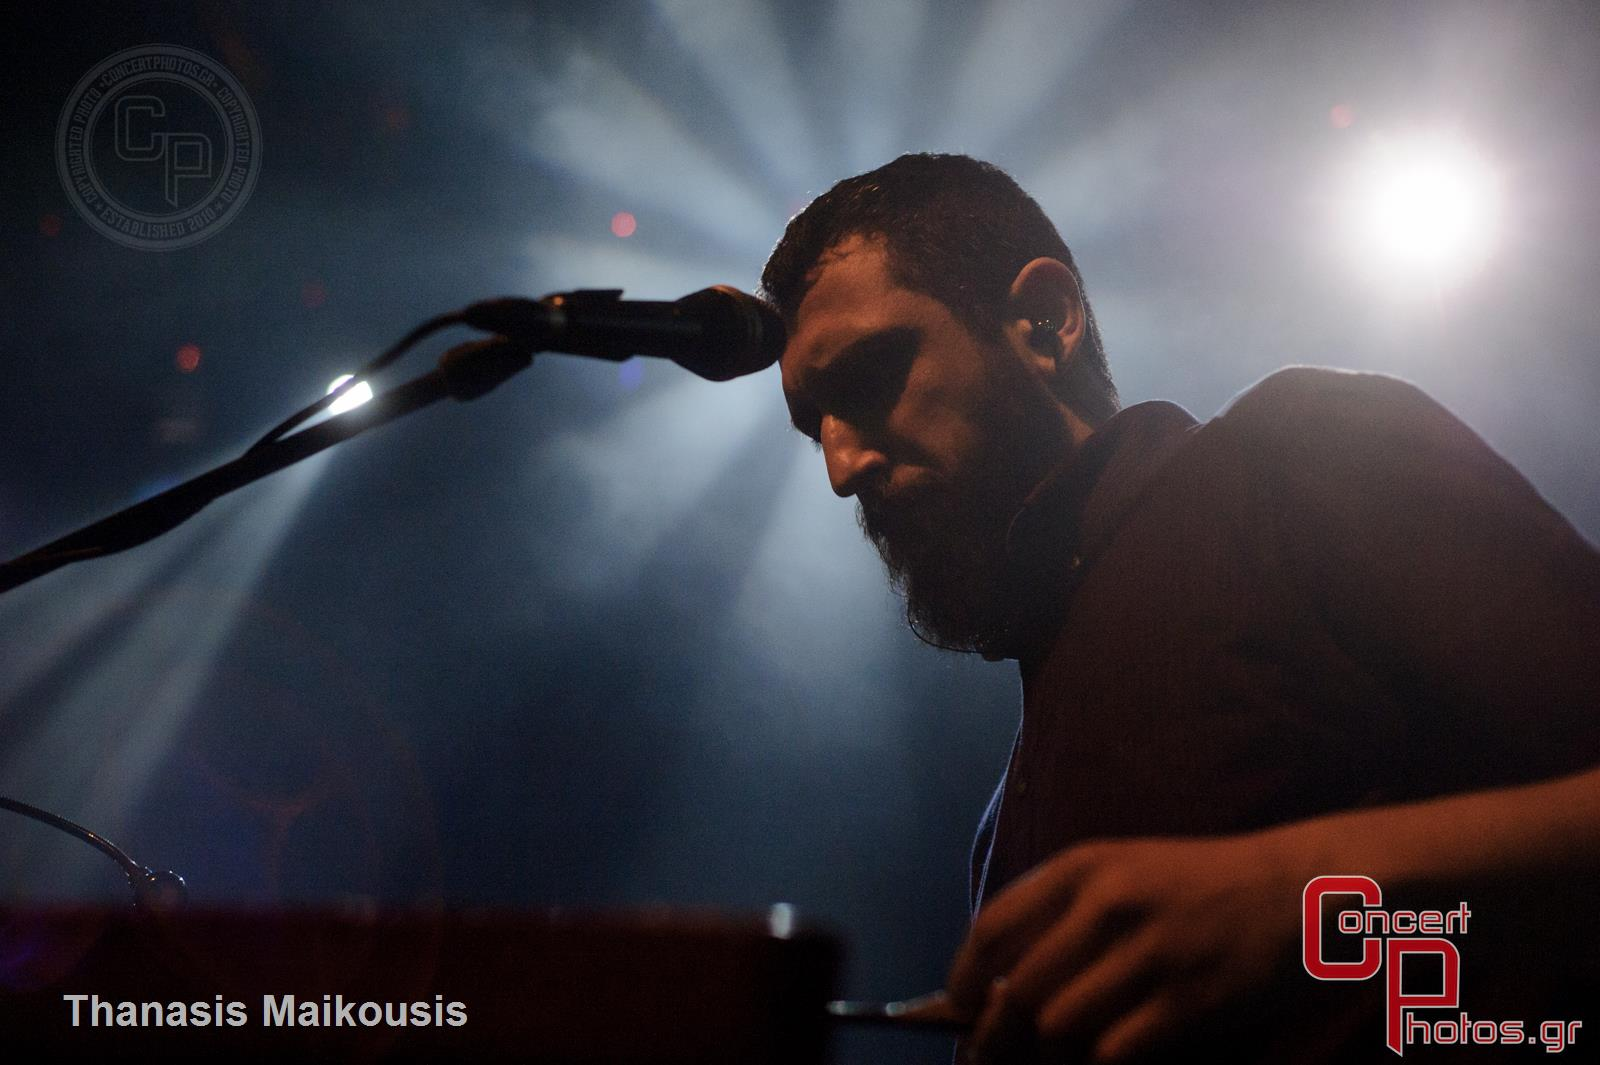 Electric Litany -  GravitySays-Electric Litany GravitySays photographer: Thanasis Maikousis - concertphotos_20150418_21_07_03